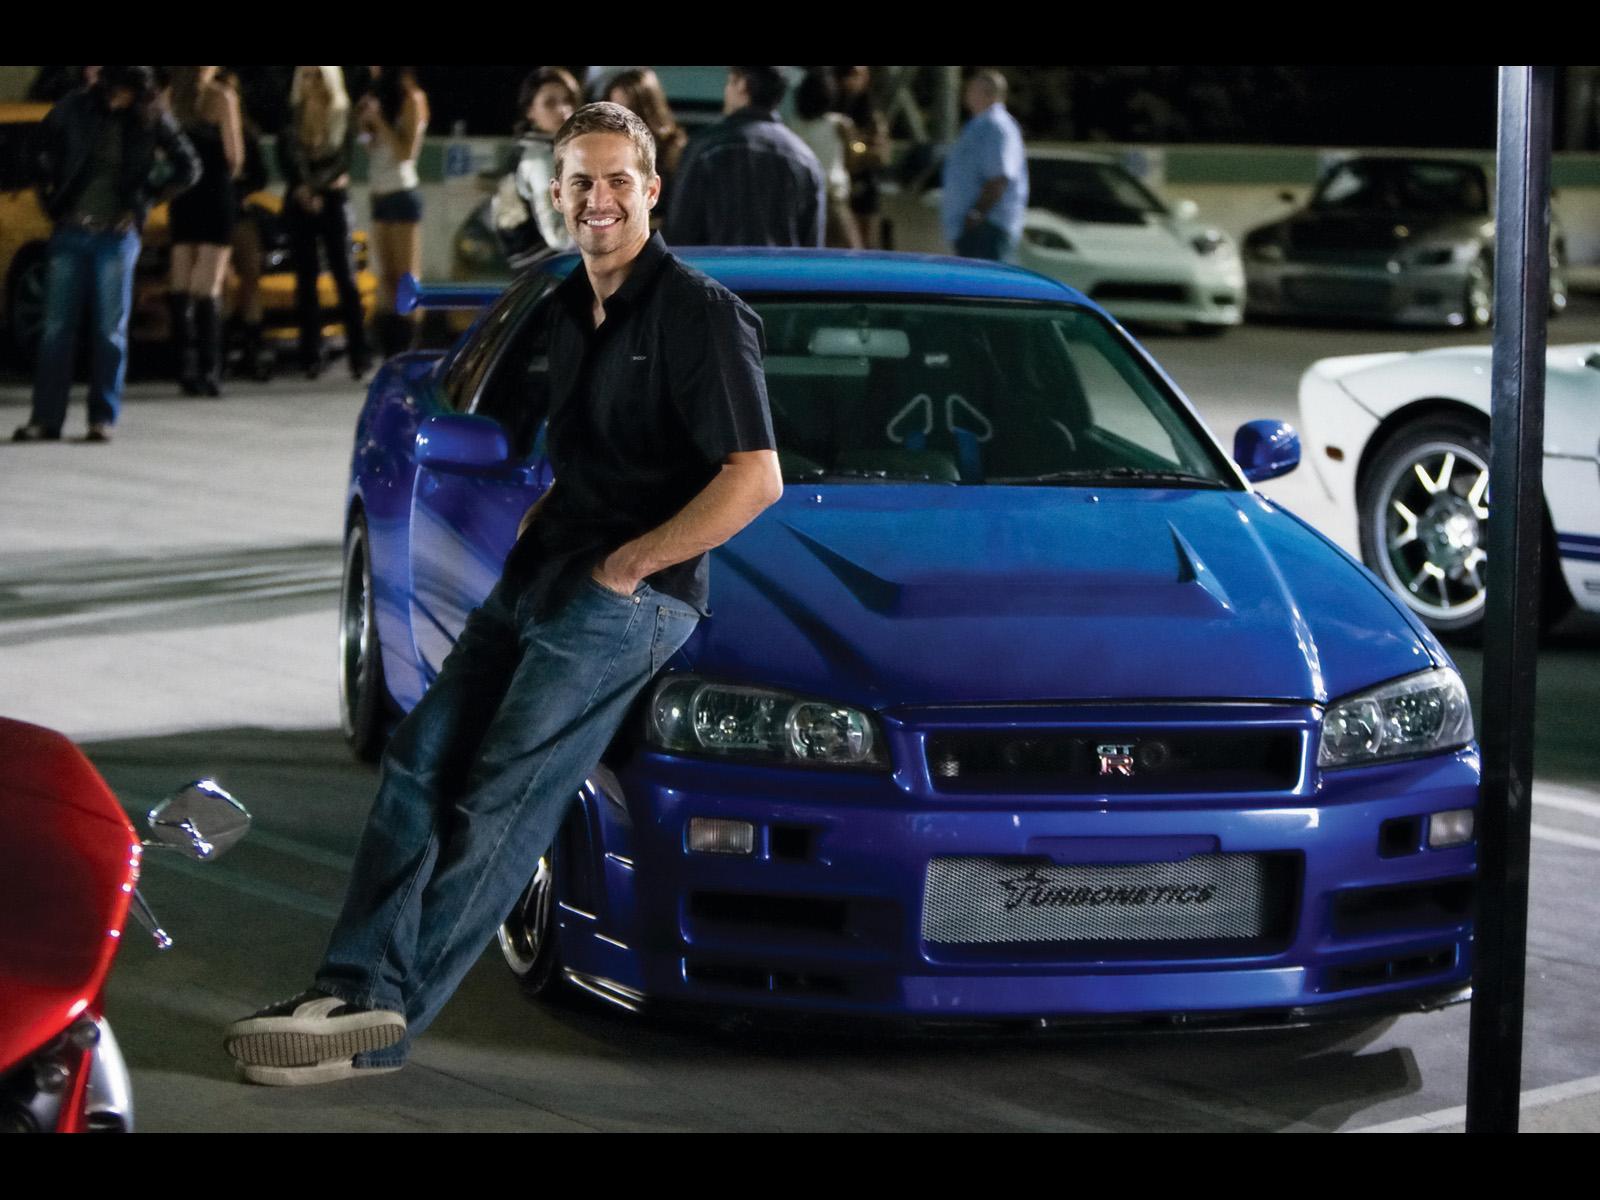 pic new posts: Wallpaper Nissan Skyline R34 Gtr